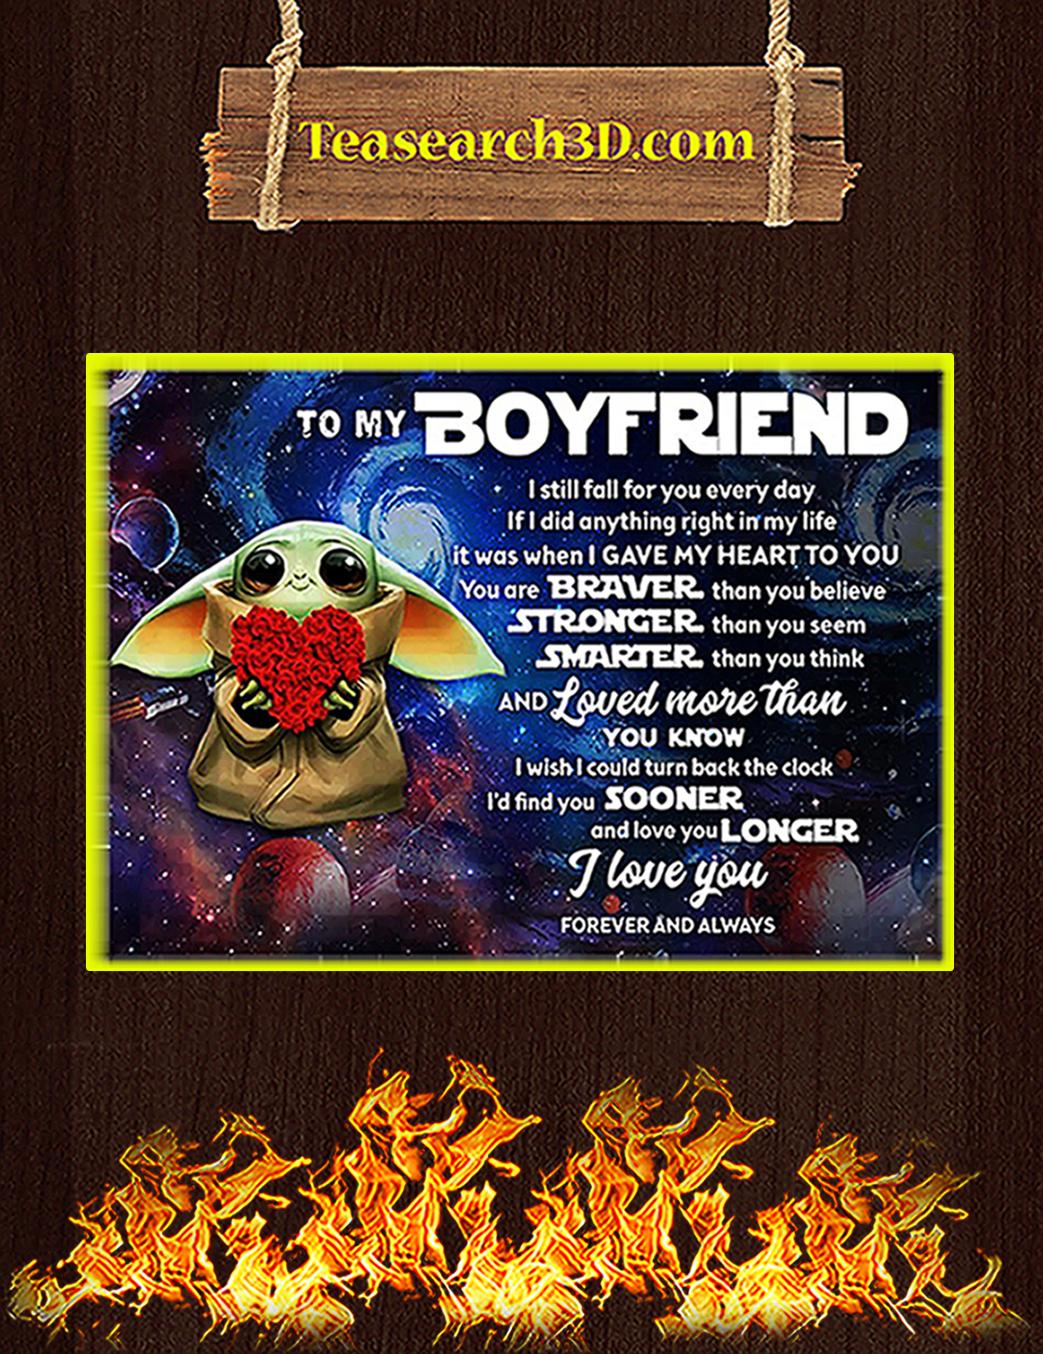 Baby yoda to my boyfriend poster A1